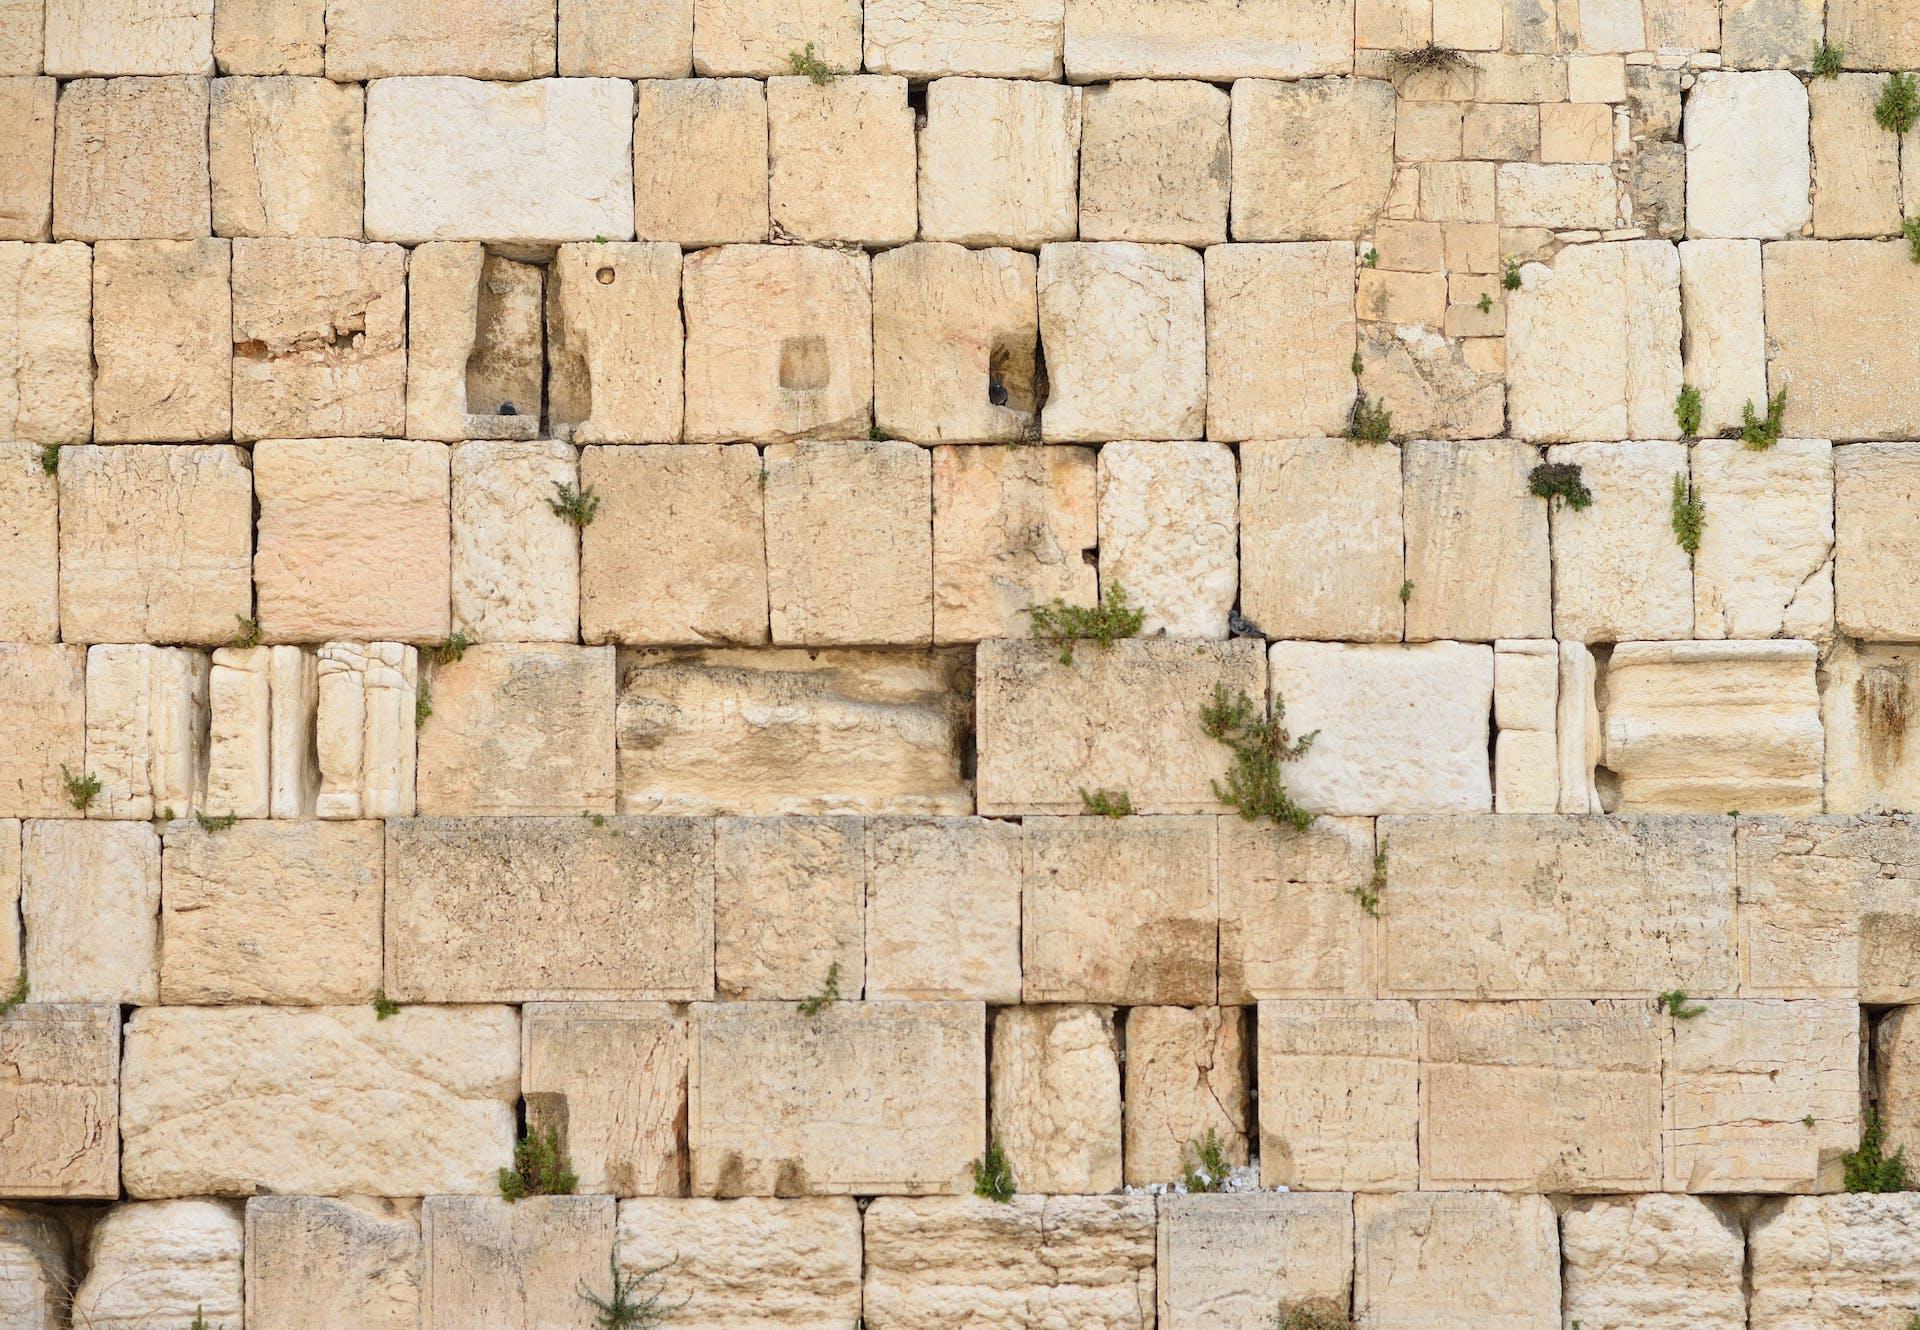 Jerusalem jøder